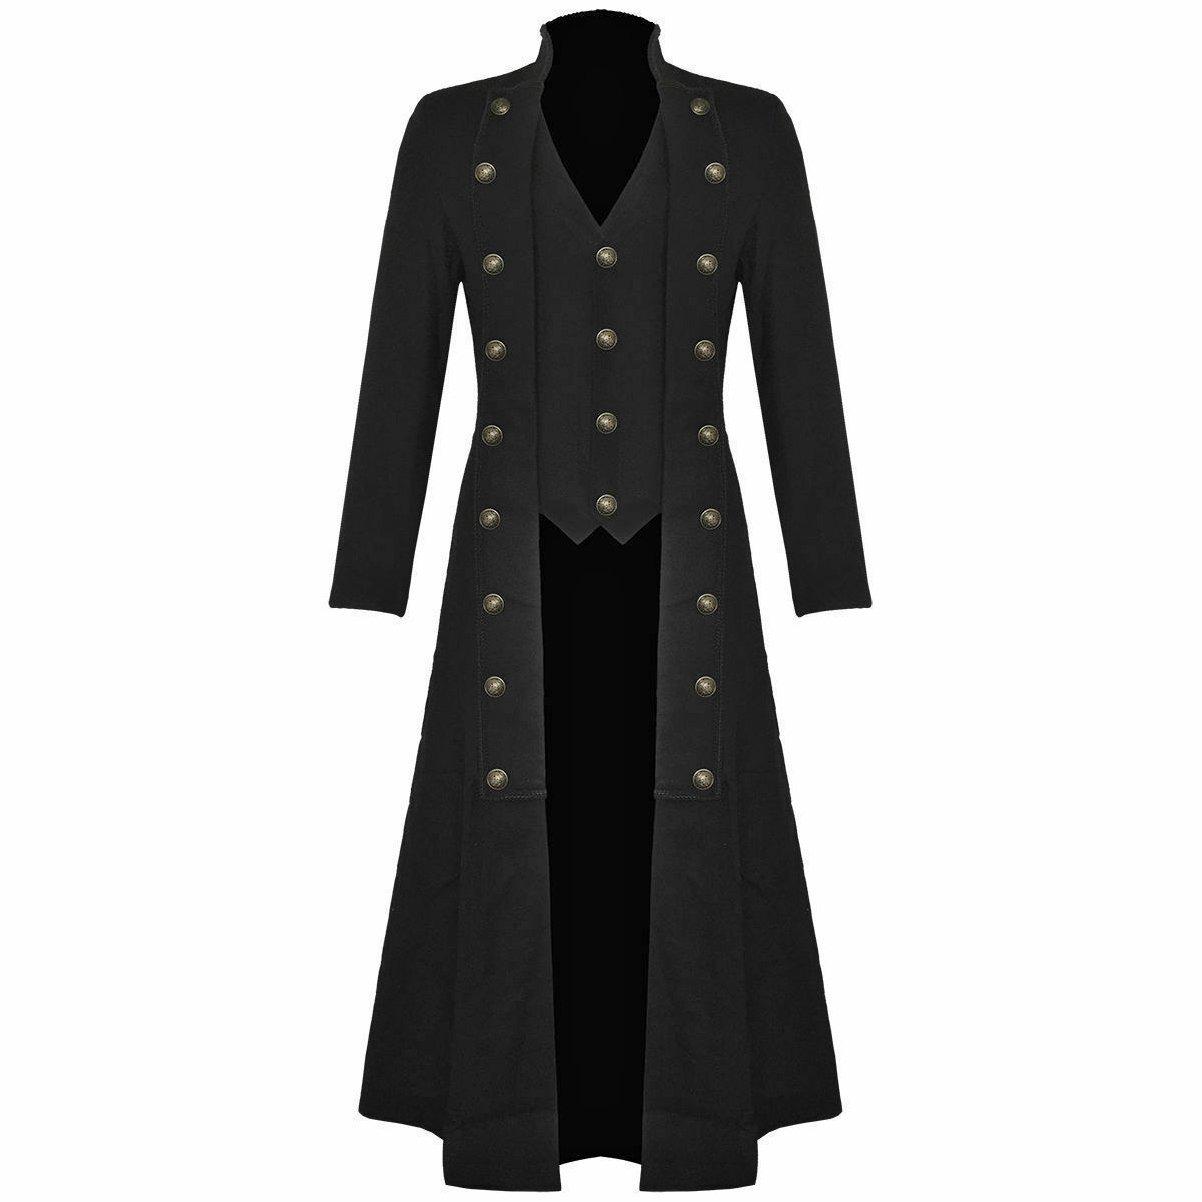 DARKROCK Men's Steampunk Military TRENCH COAT Long Jacket Black (1)